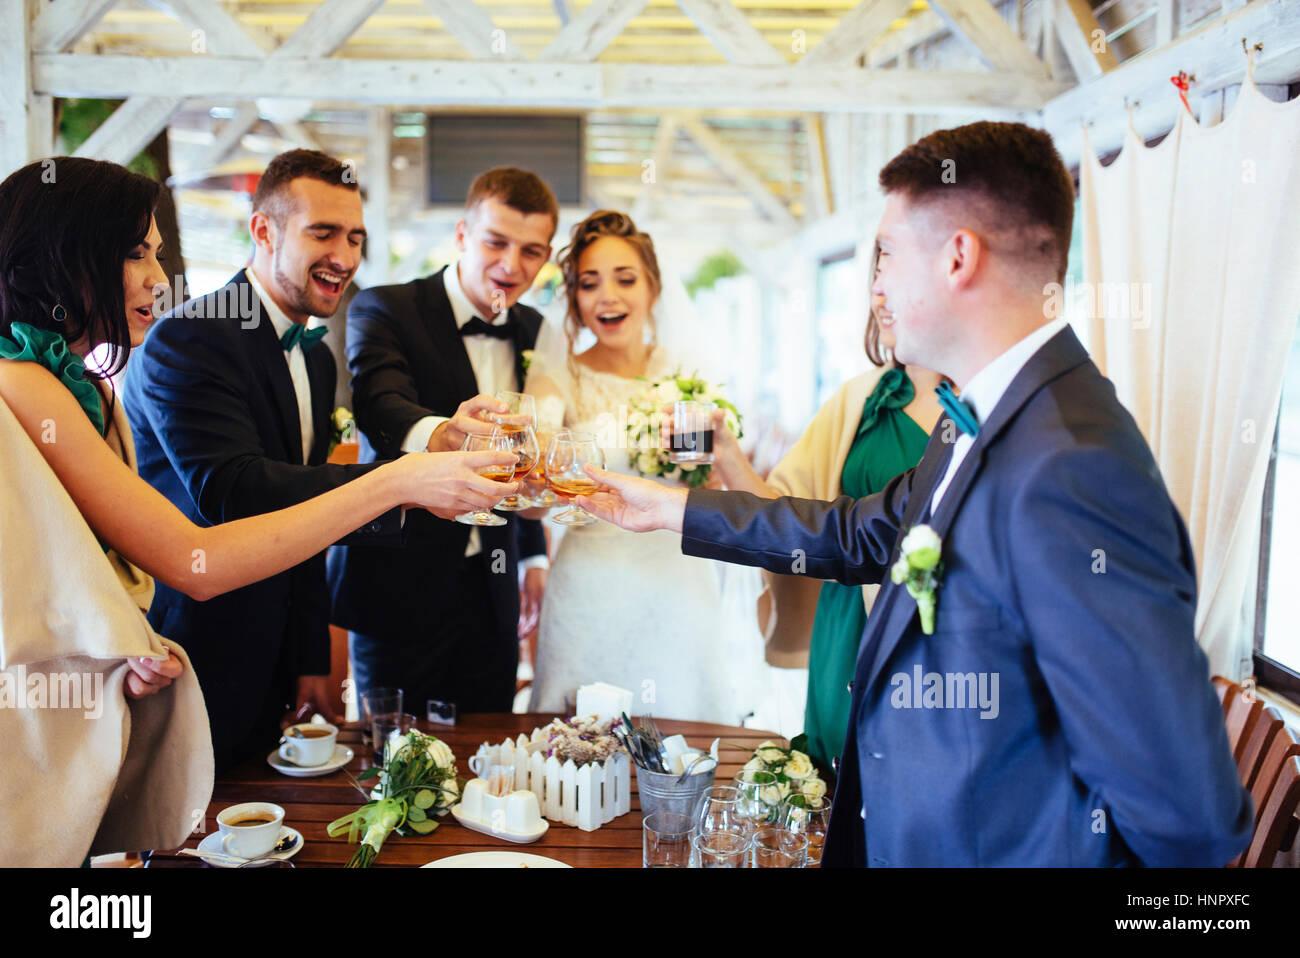 Día de boda novias con amigos en un café Imagen De Stock